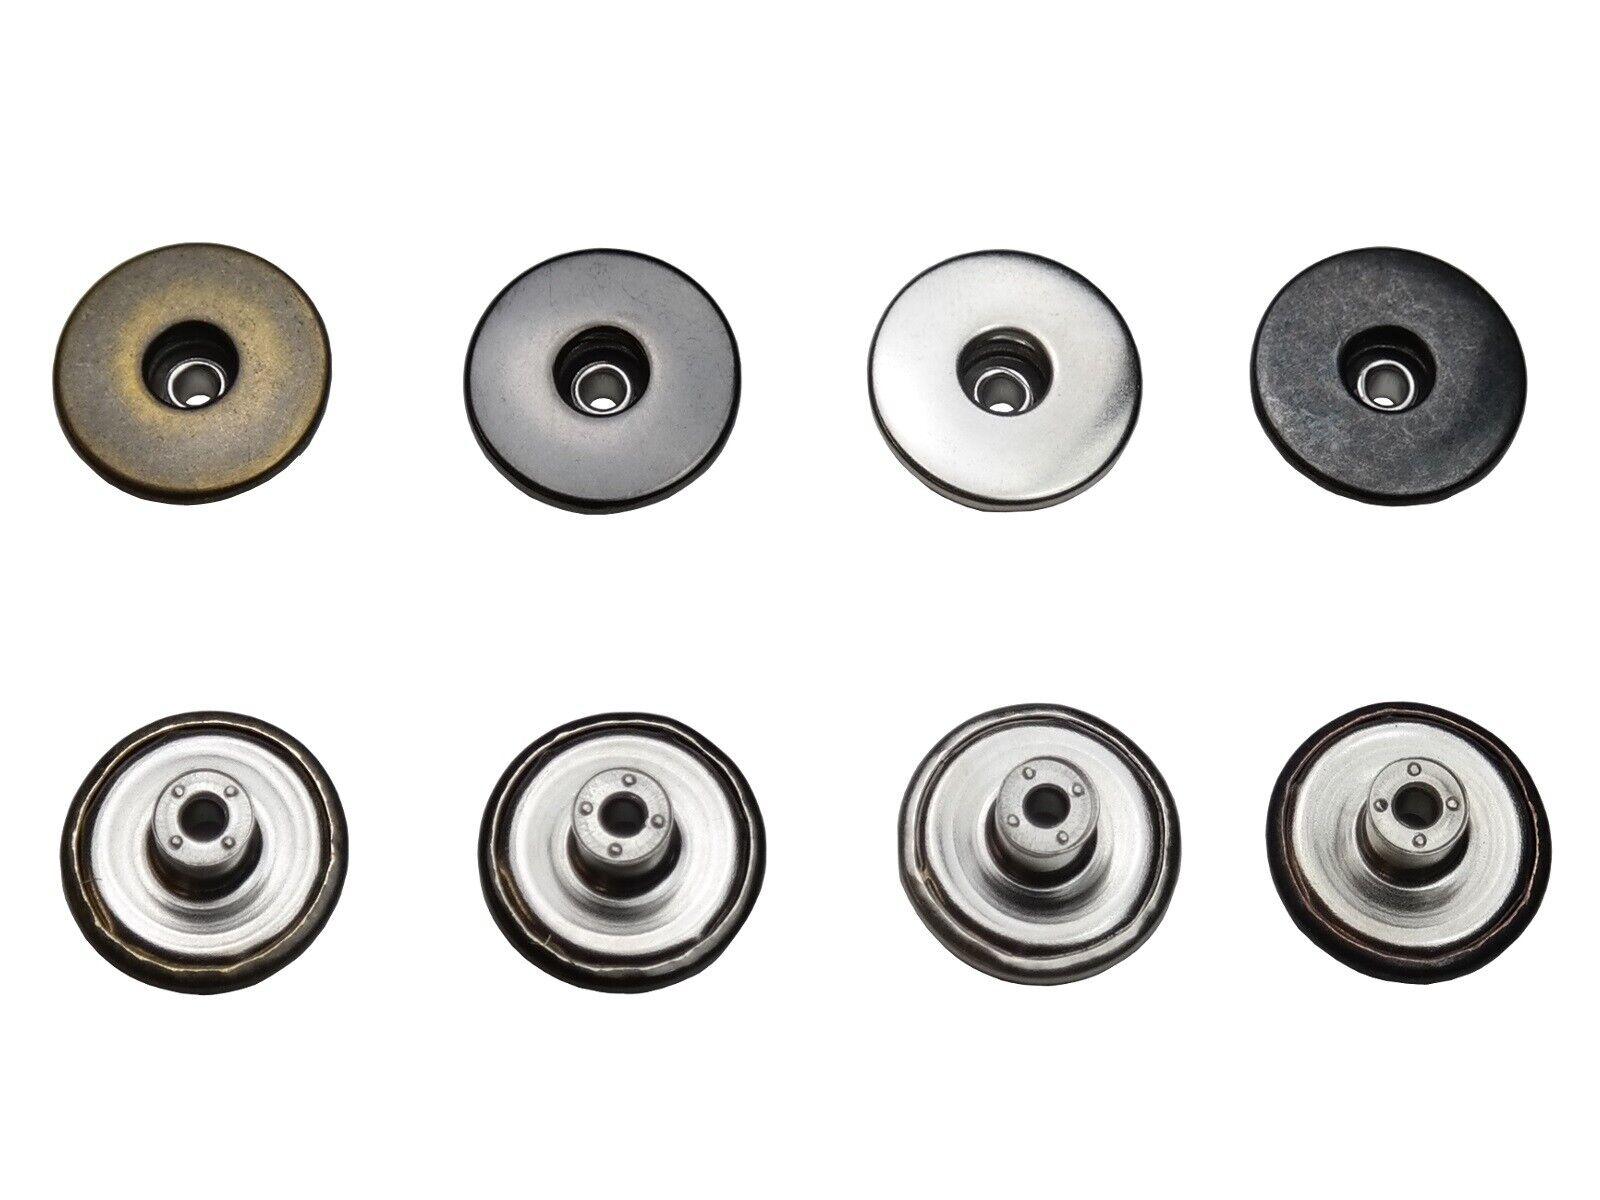 Jeansknöpfe, Rostfrei, Metallknopf, 14mm, 17mm, 20mm,Hosen, Jacken,Metall Knöpfe